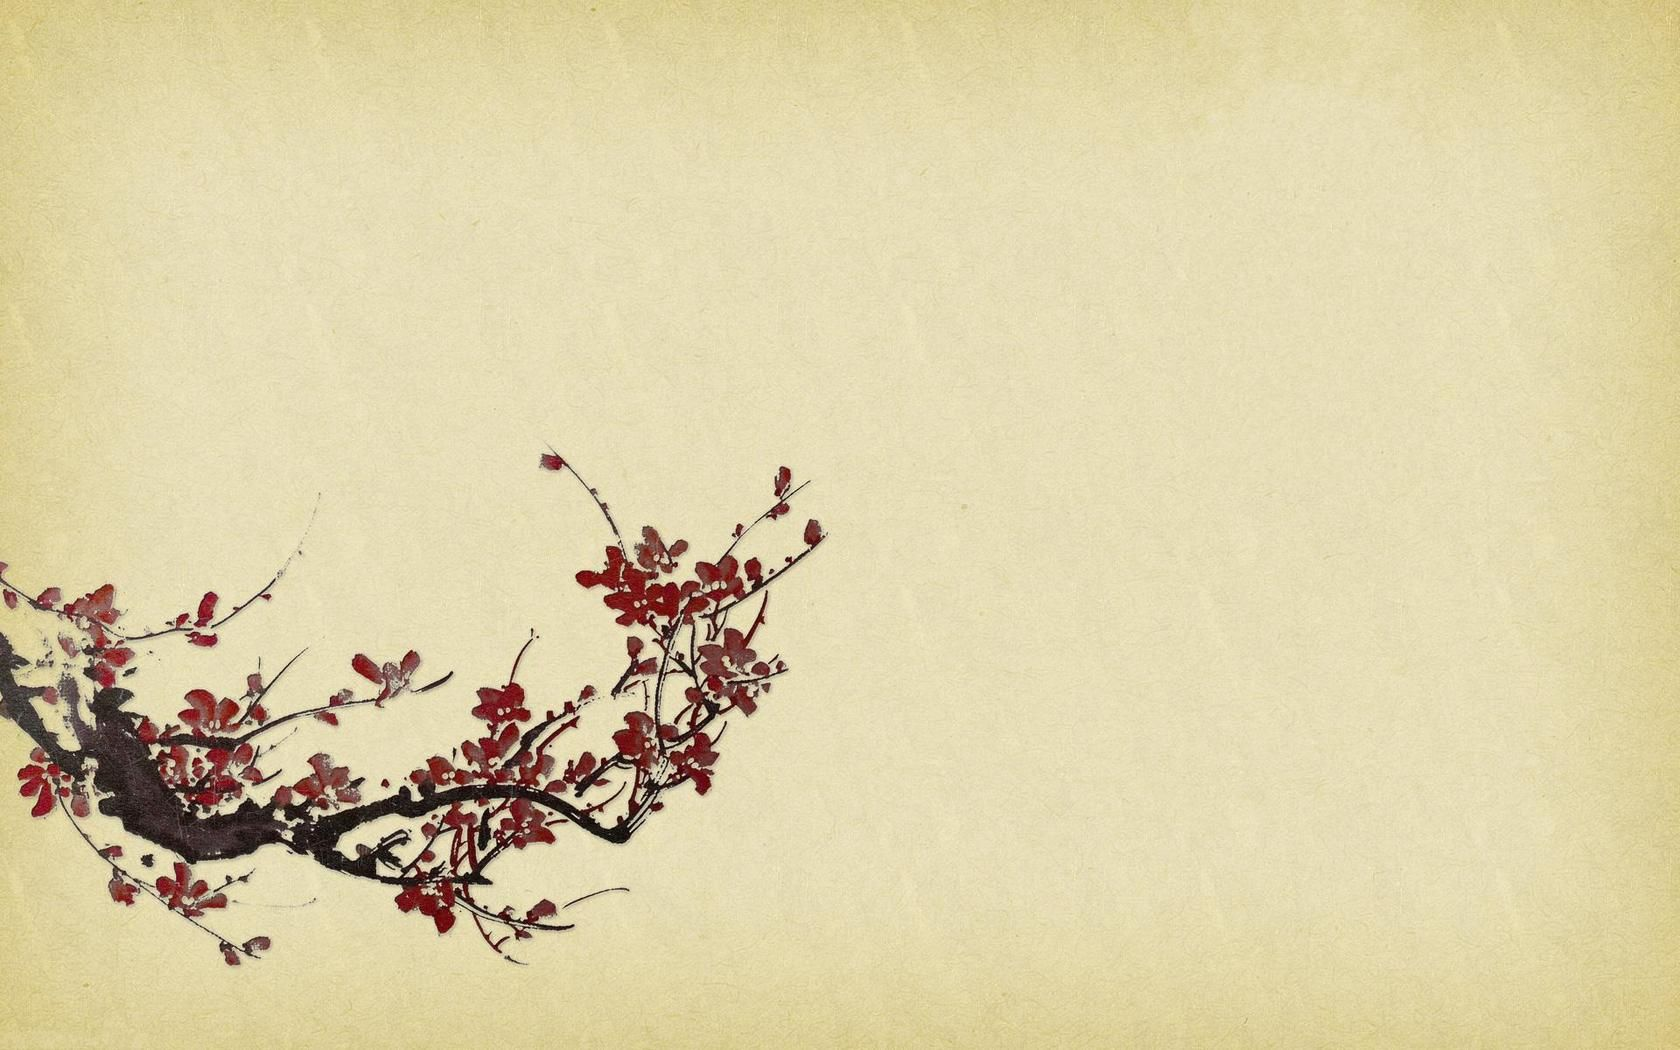 japanese koi fish wallpaper desktop